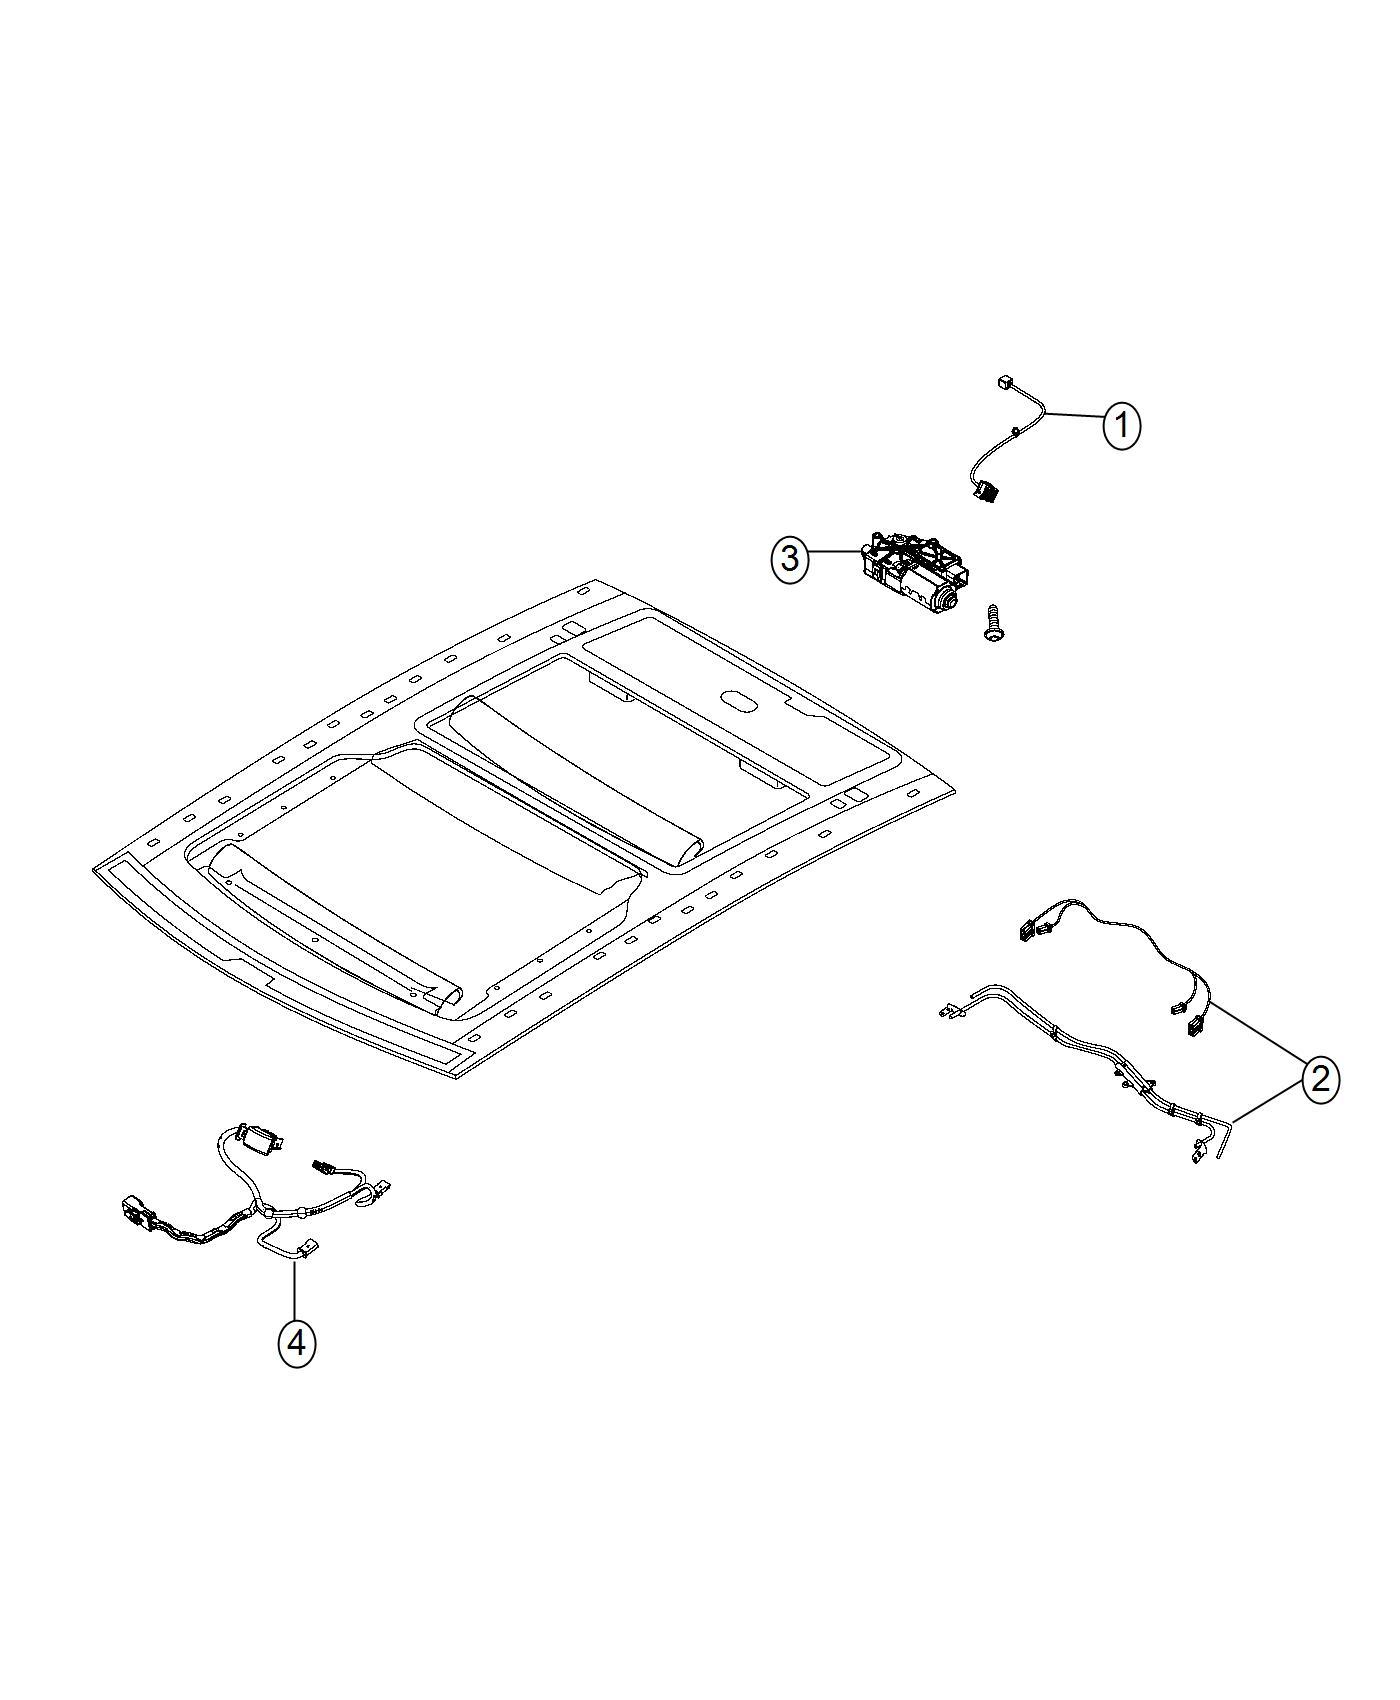 wiring diagram jeep renegade 2018